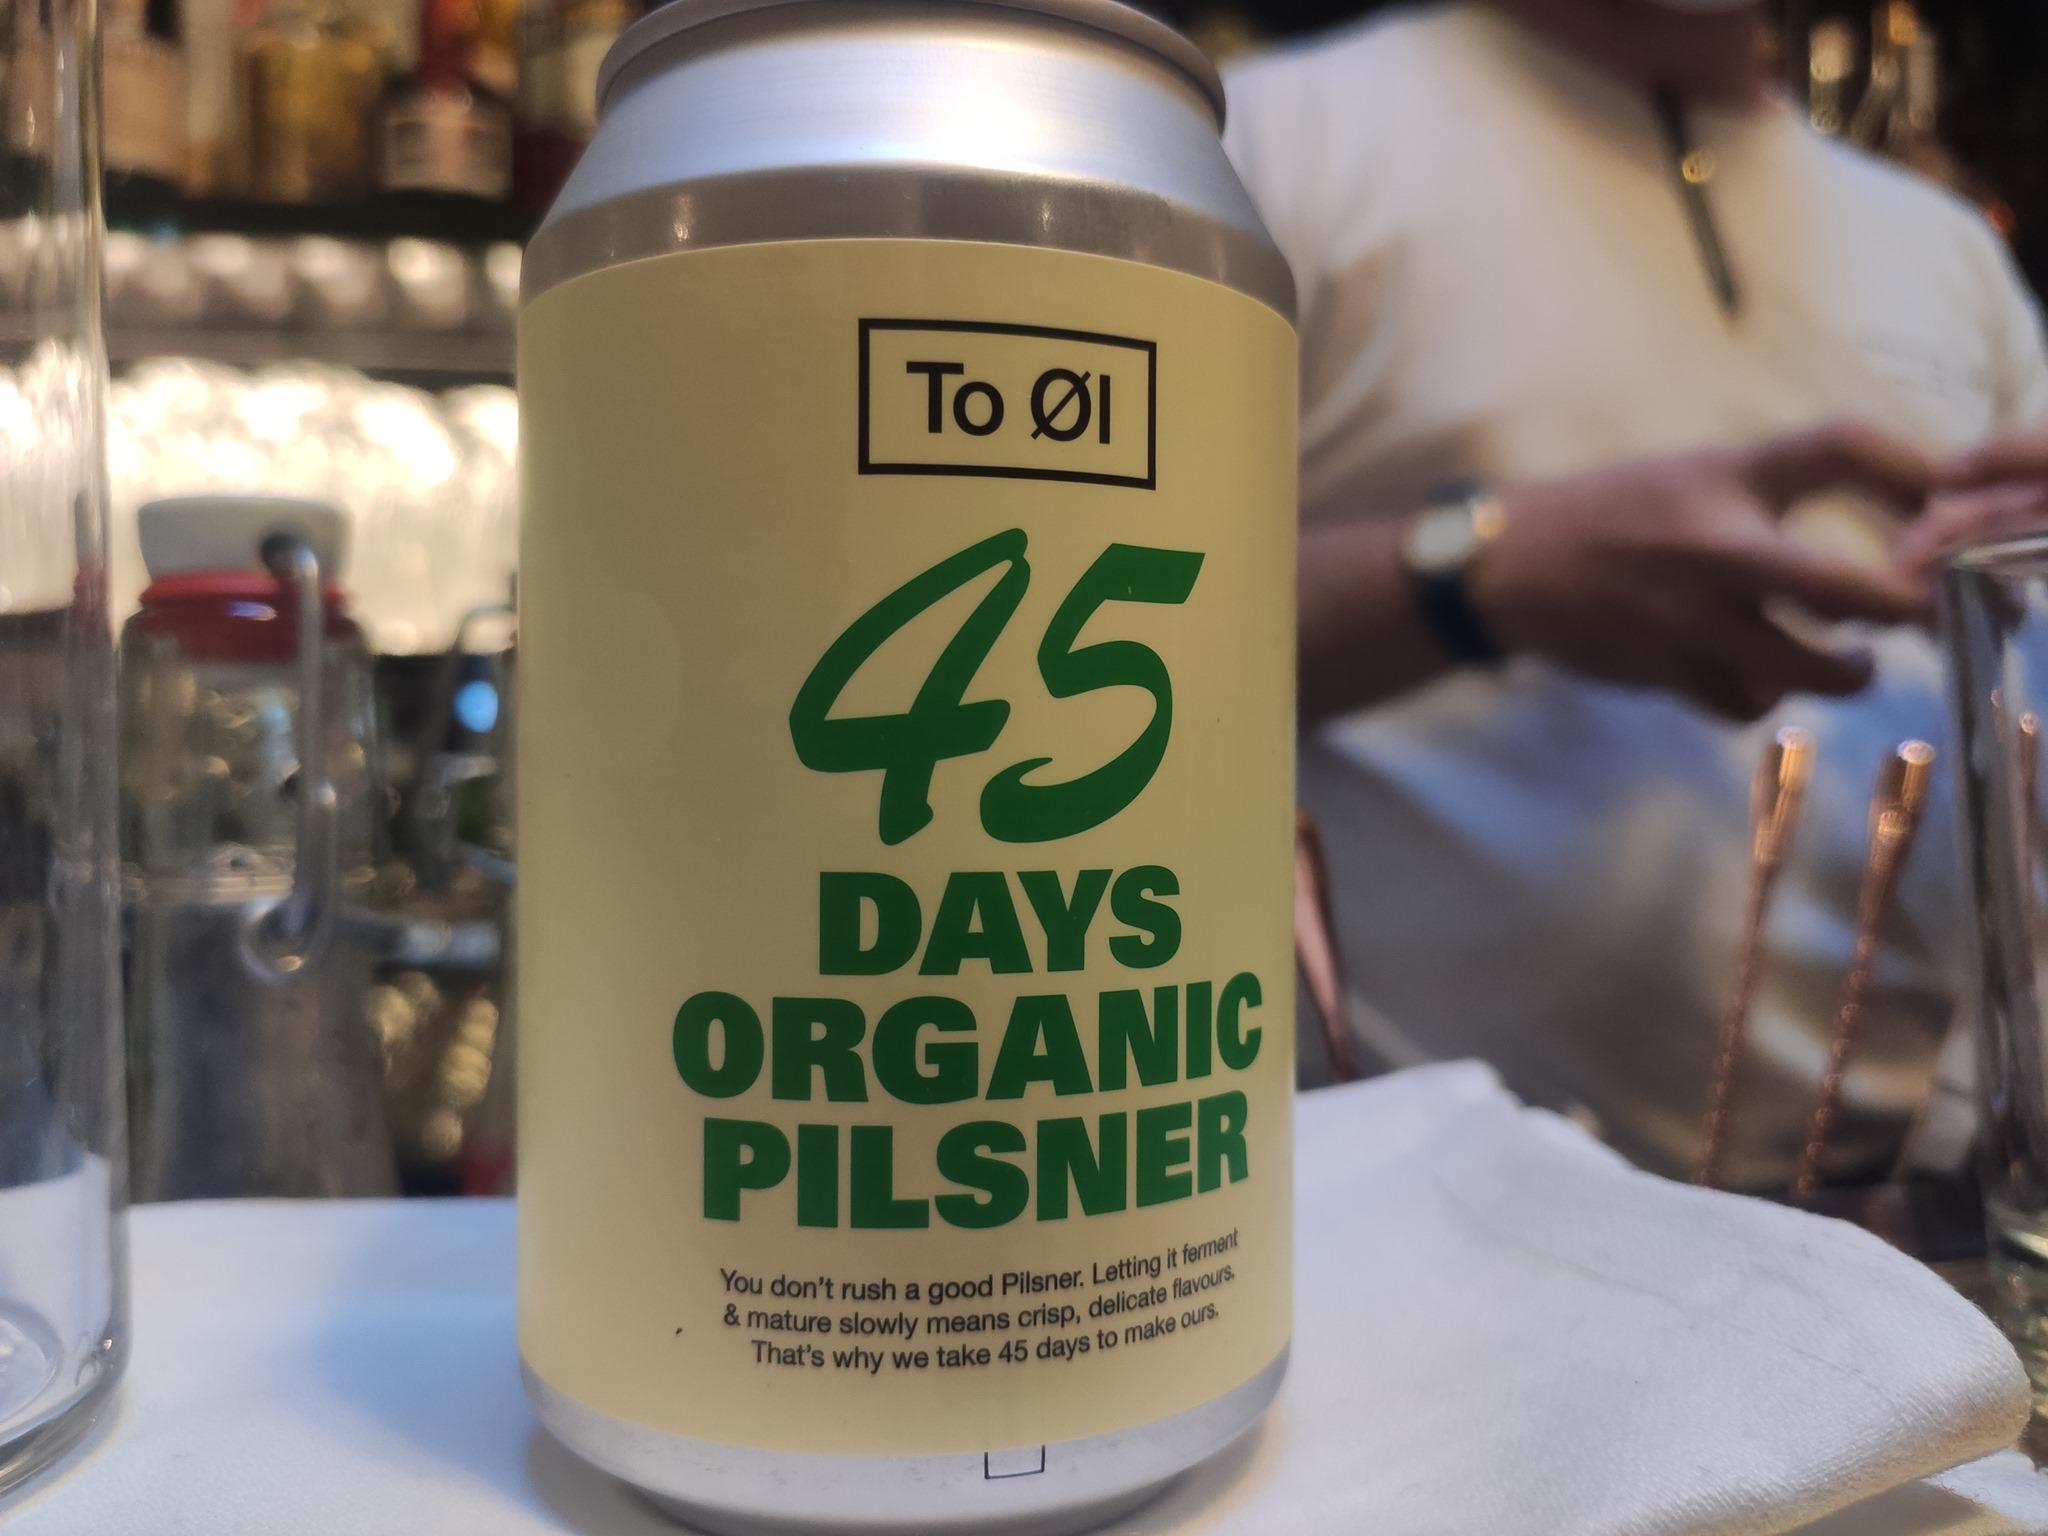 Bière To Ol - 45 days organic pilsner